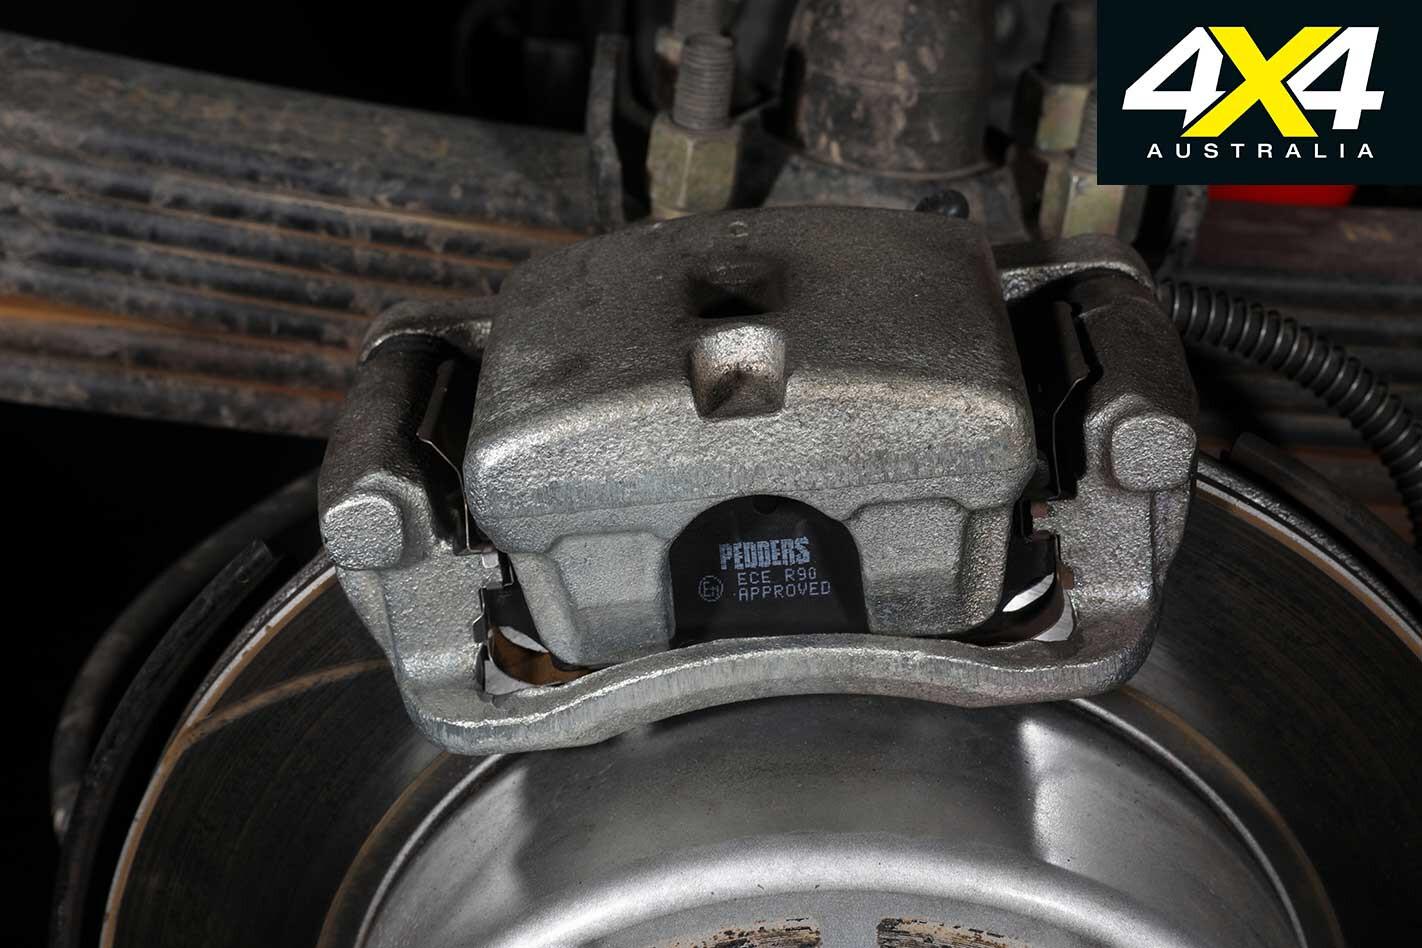 Pedders Disc Brake Conversion Kit Calipers Jpg